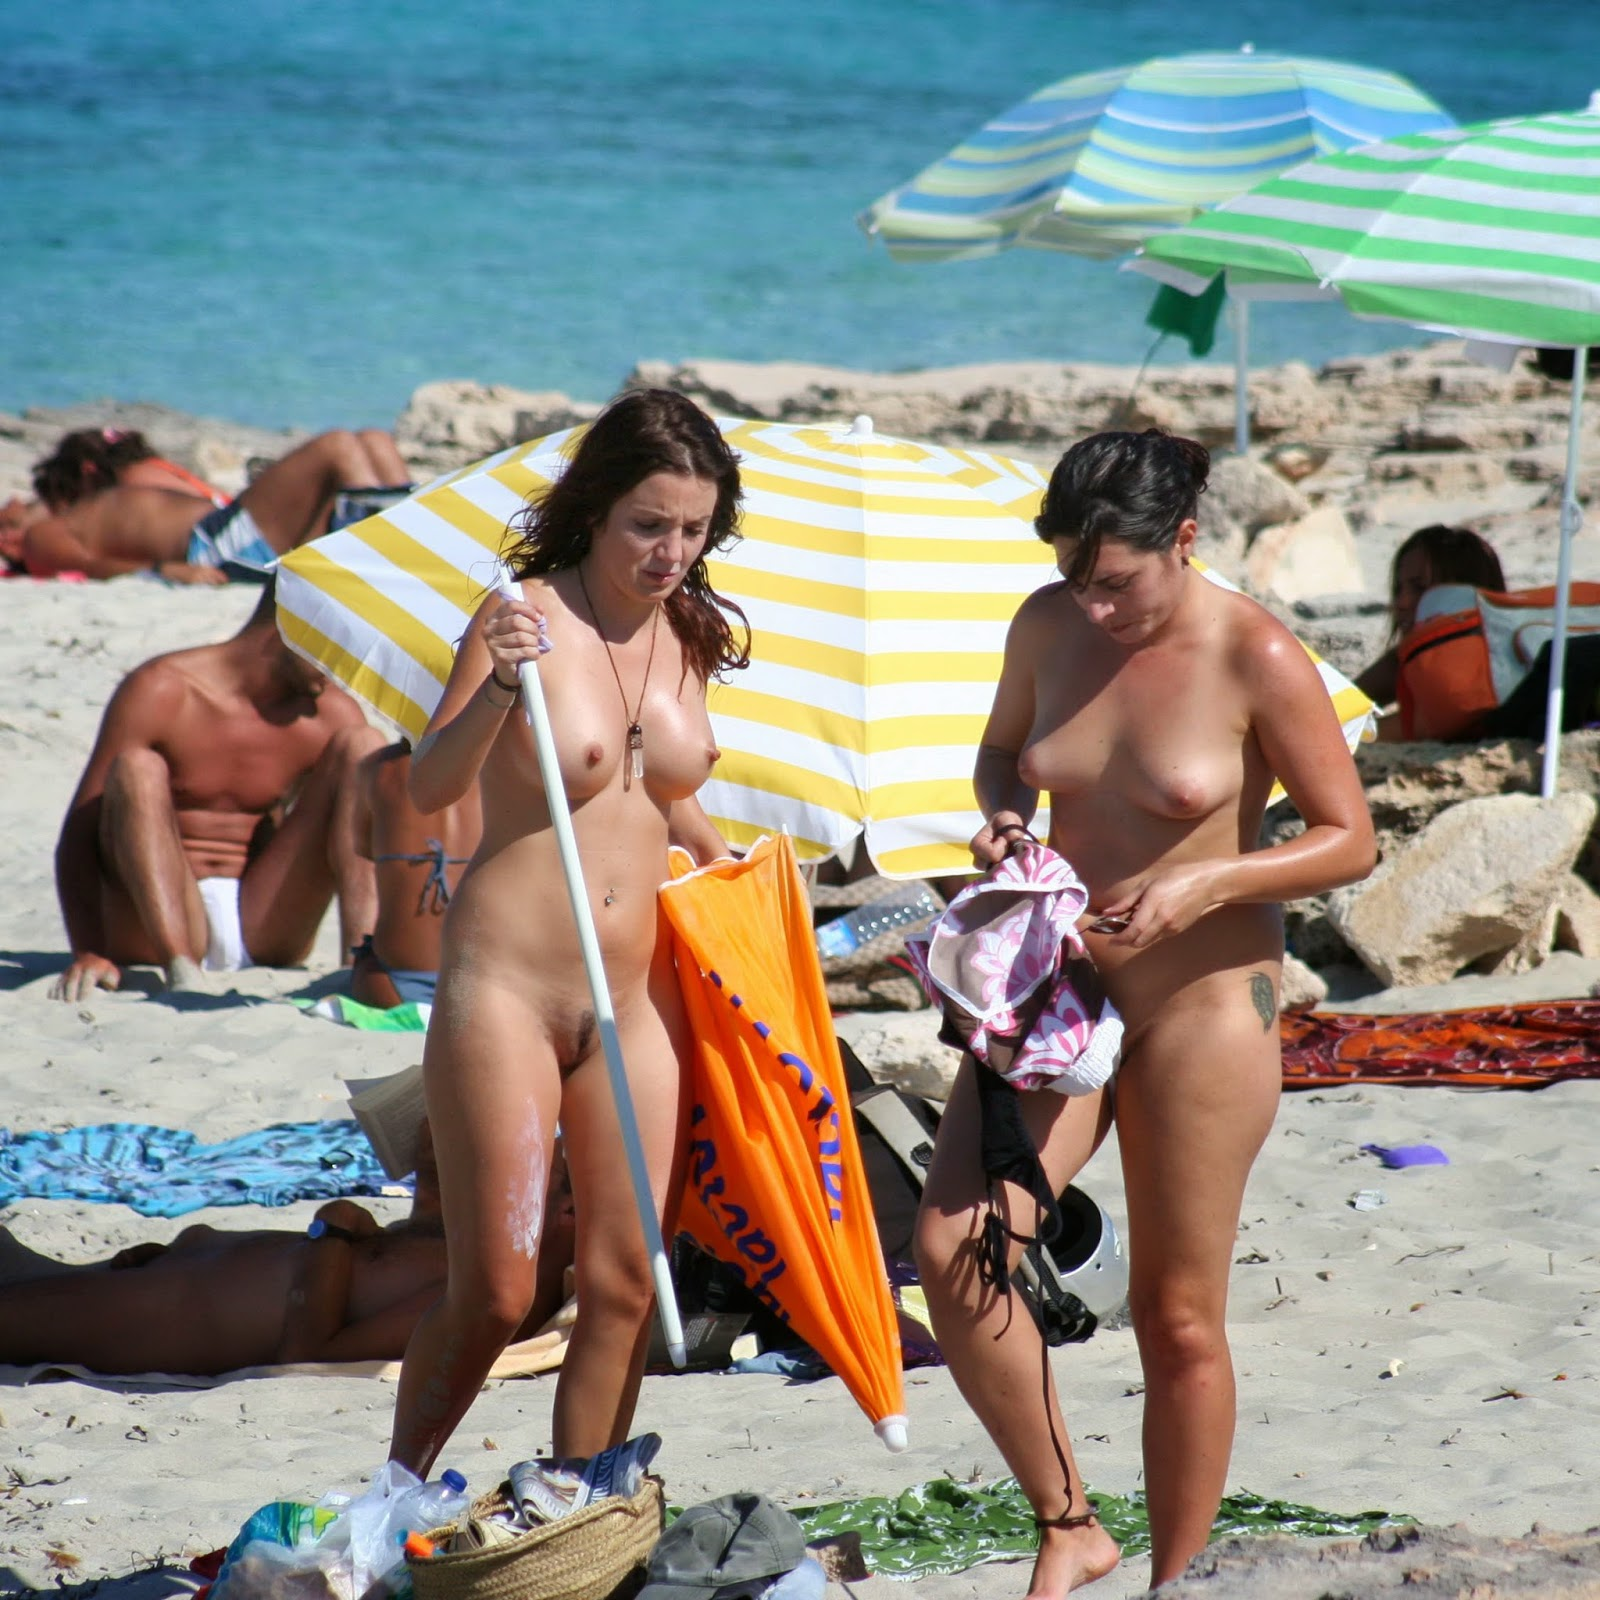 from Ridge nake girl on the beach